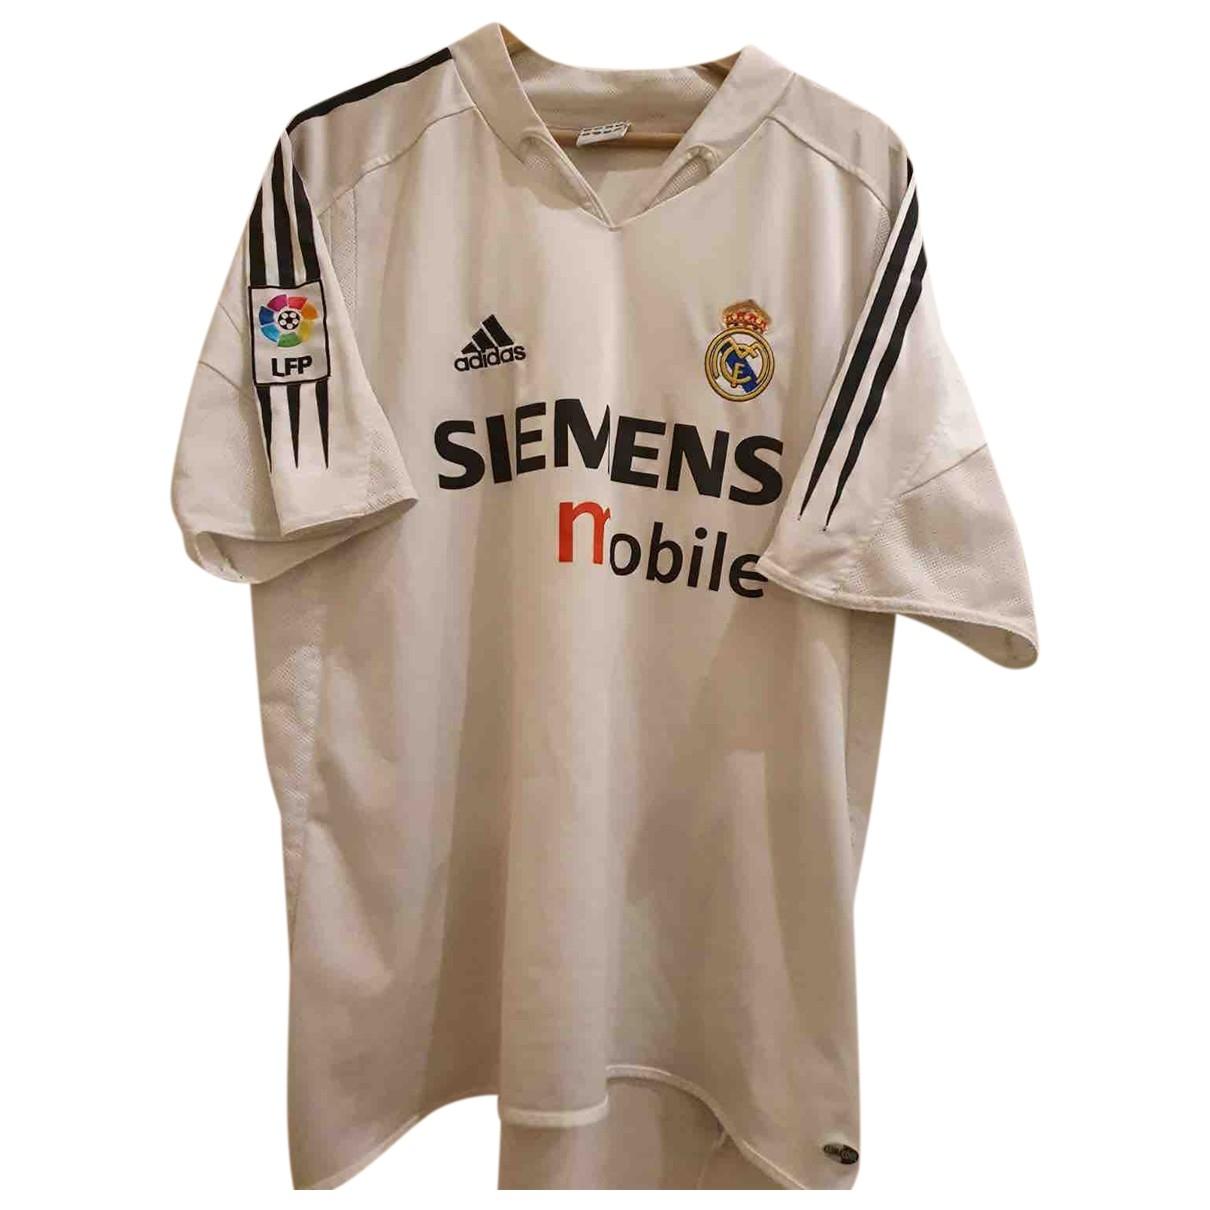 Adidas - Tee shirts   pour homme - blanc